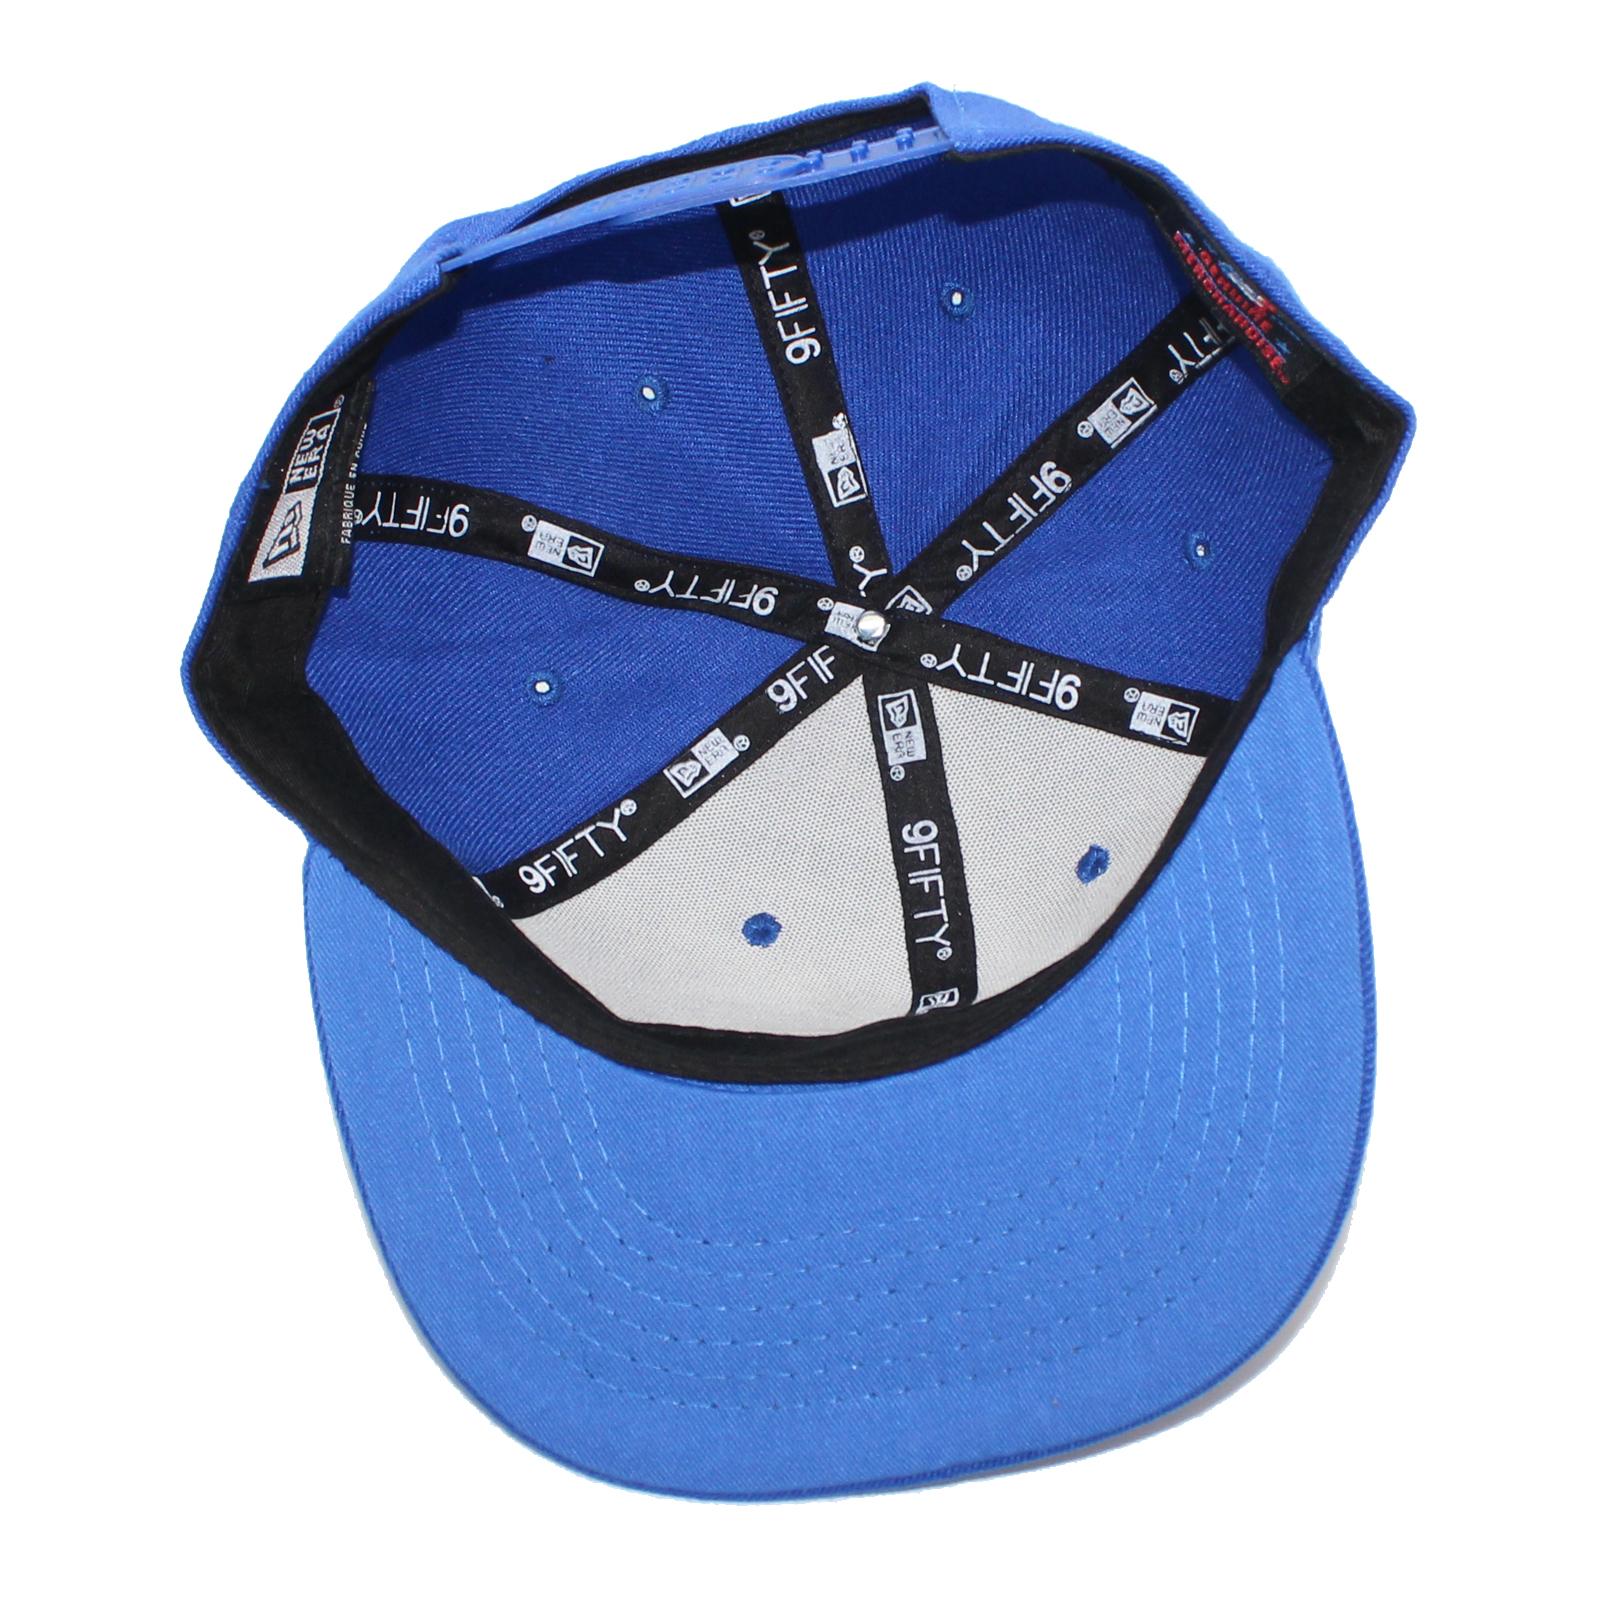 74e80f2d724 Pungles - Online Store - MLB Baseball Snapback New Era Adjustable ...